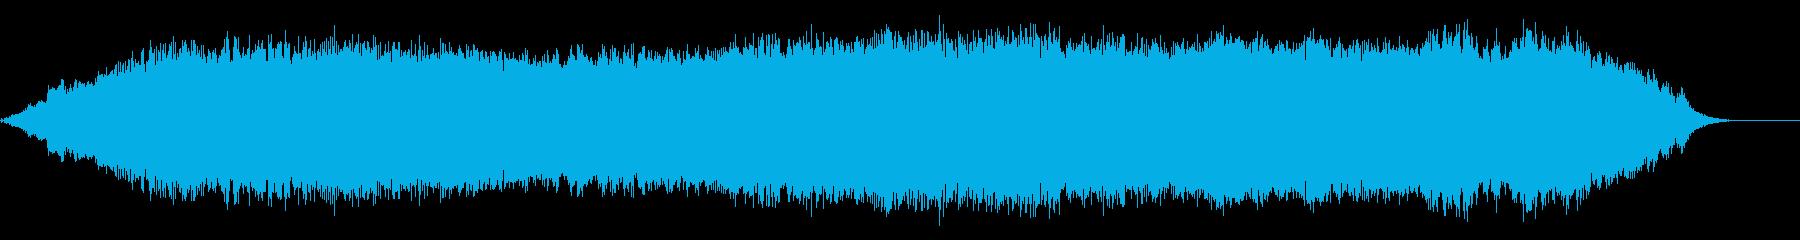 Drill アニメ風ドリル音 歯医者 5の再生済みの波形